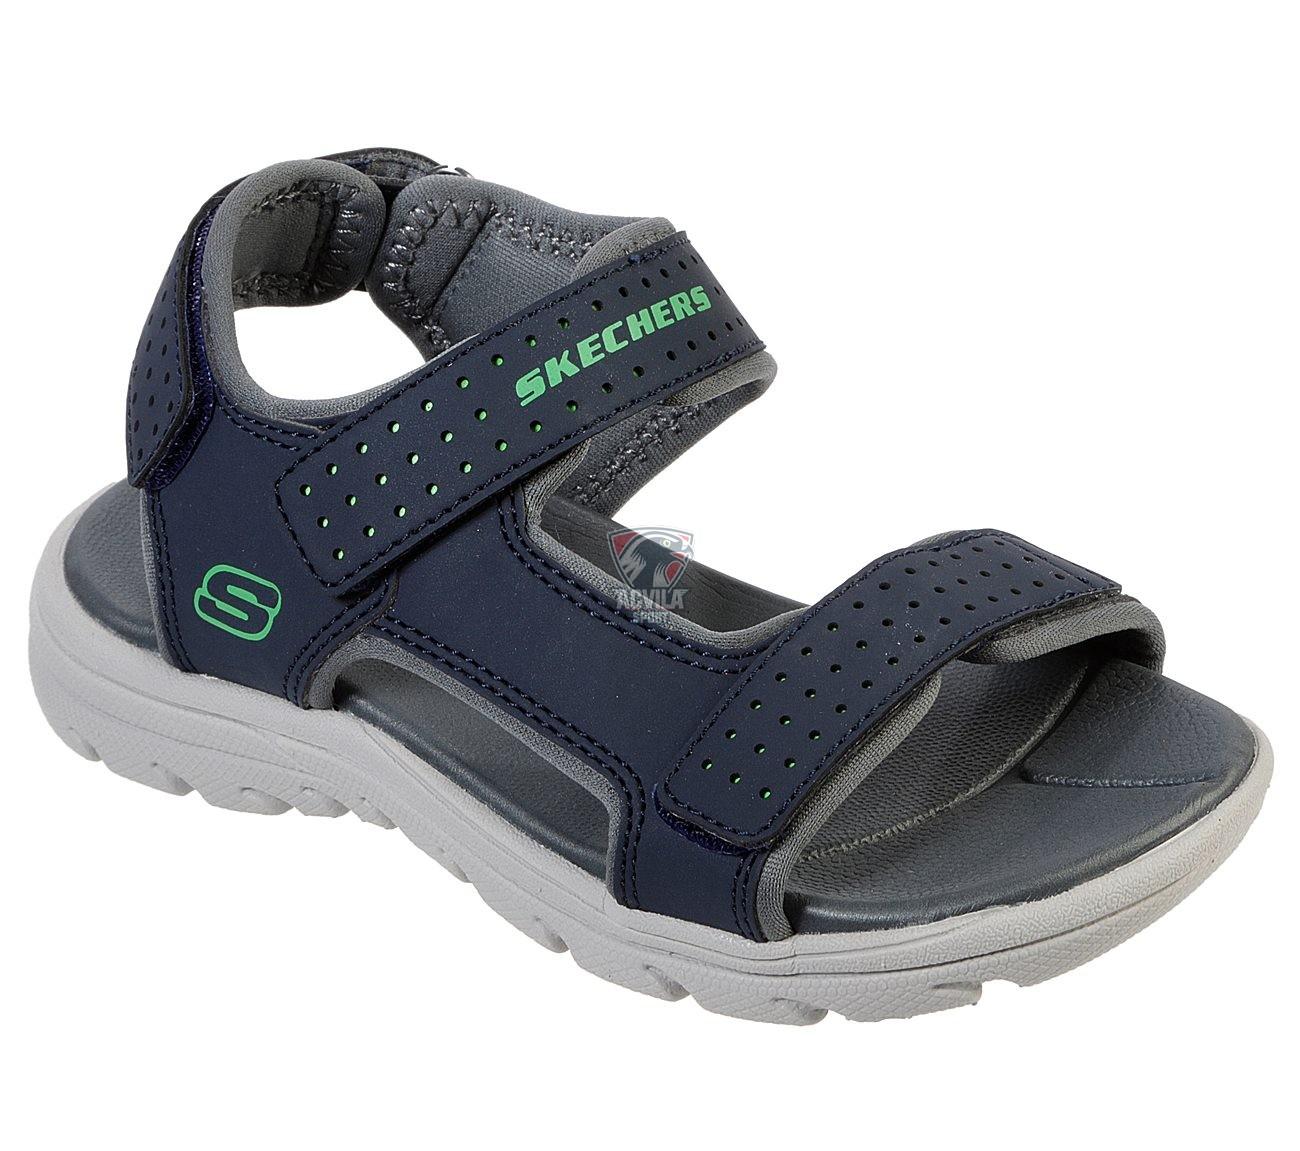 photo 4 Детская обувь SKECHERS SUPREME - RIVER BLAST